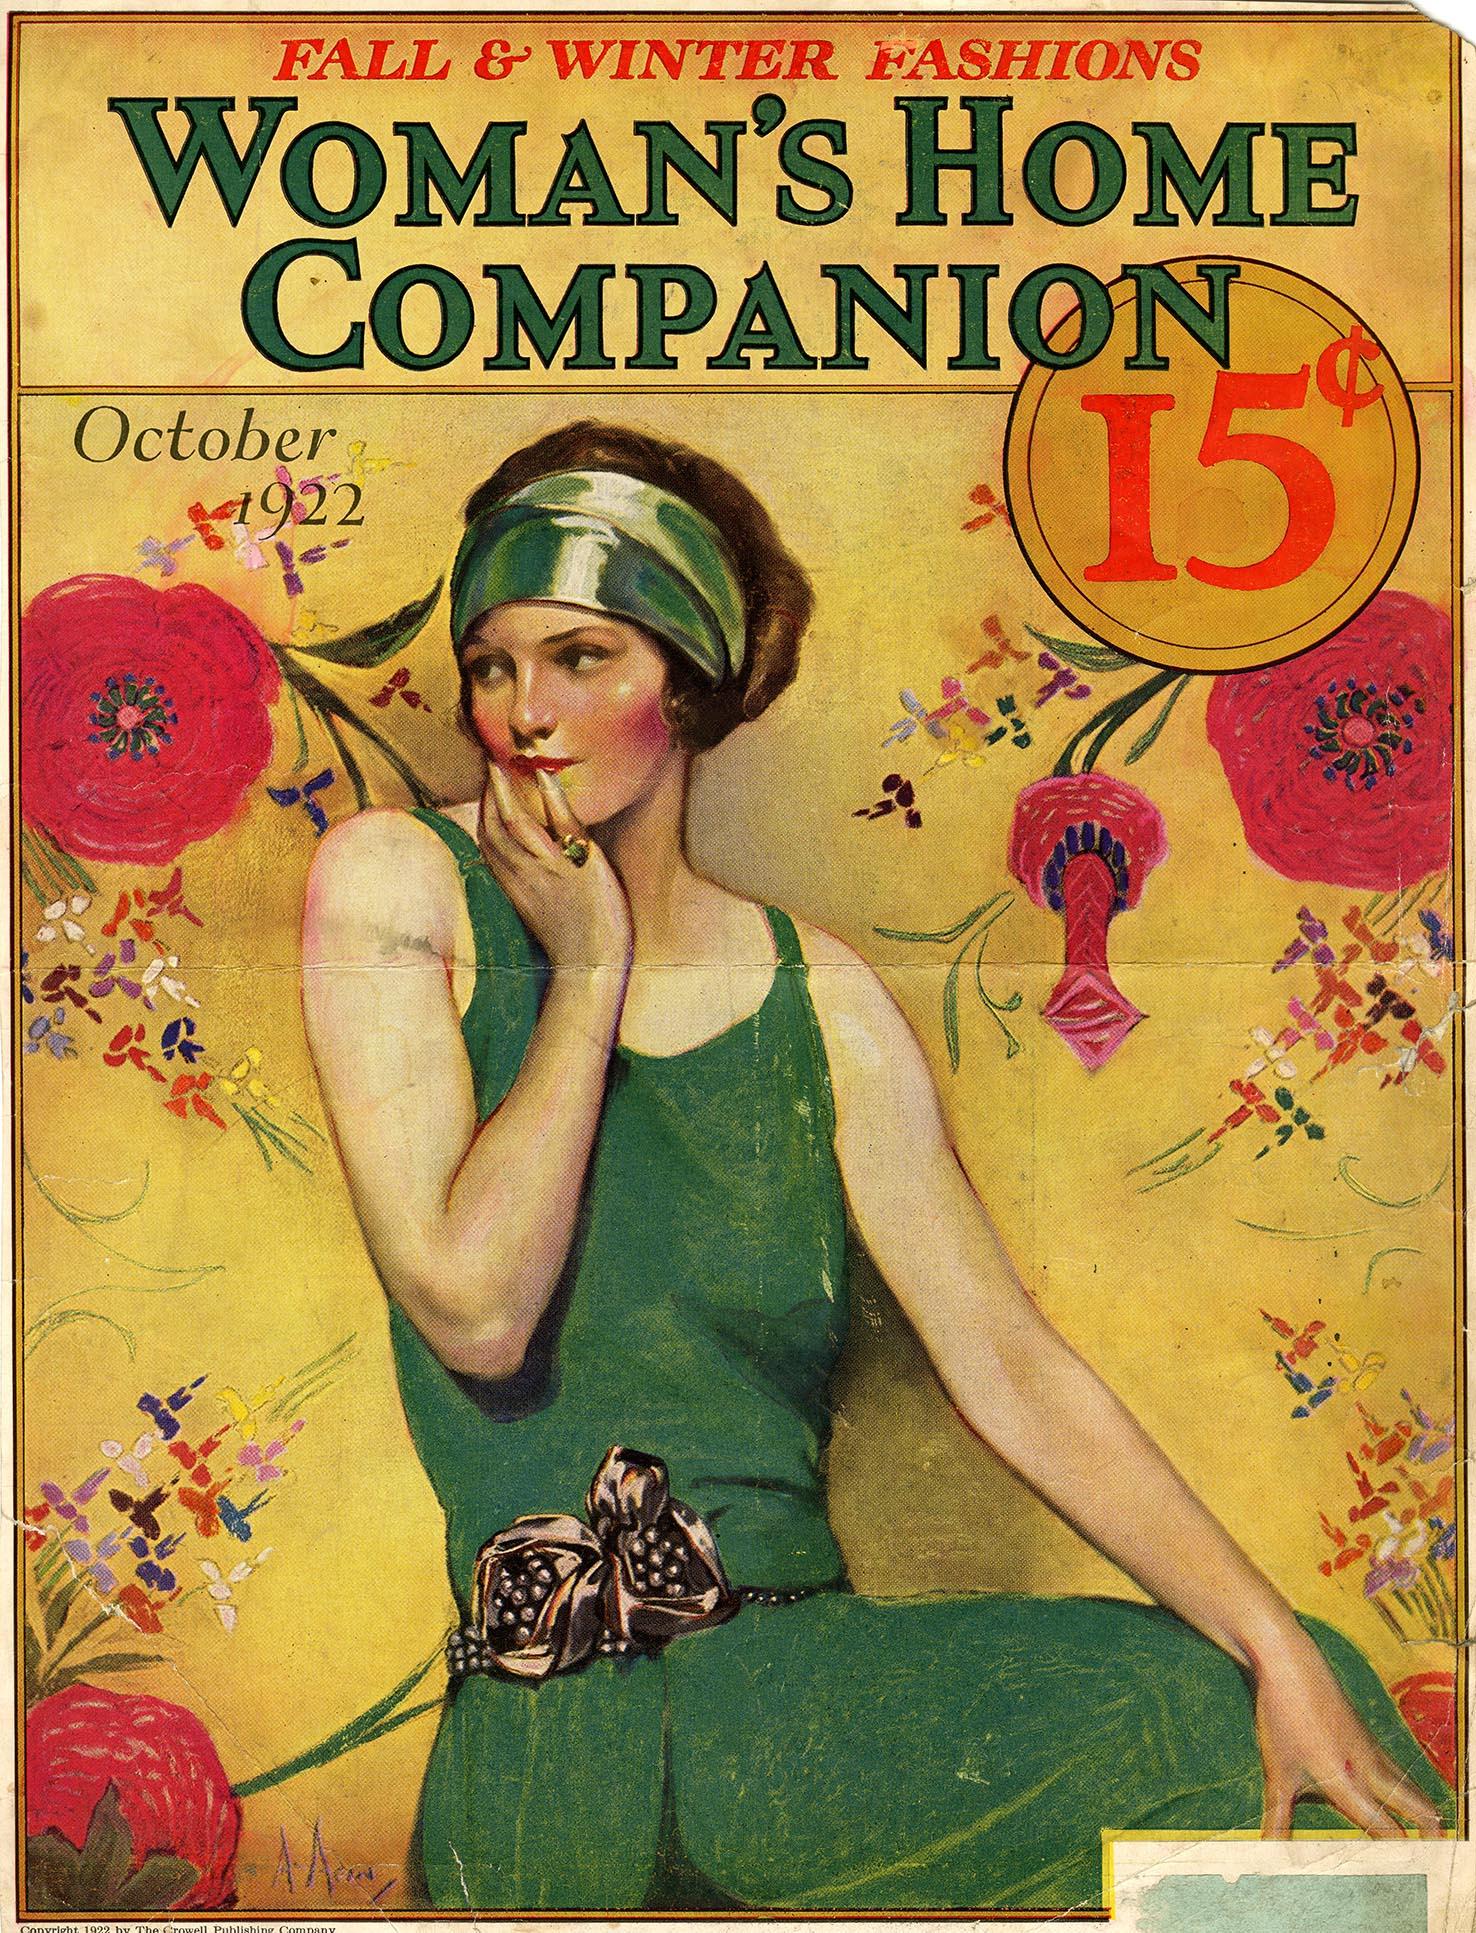 Neysa McMein, cover illustration,  Woman's Home Companion , October 1922. M agazine tear sheet, Walt Reed Illustration Archive, Washington University in St. Louis.